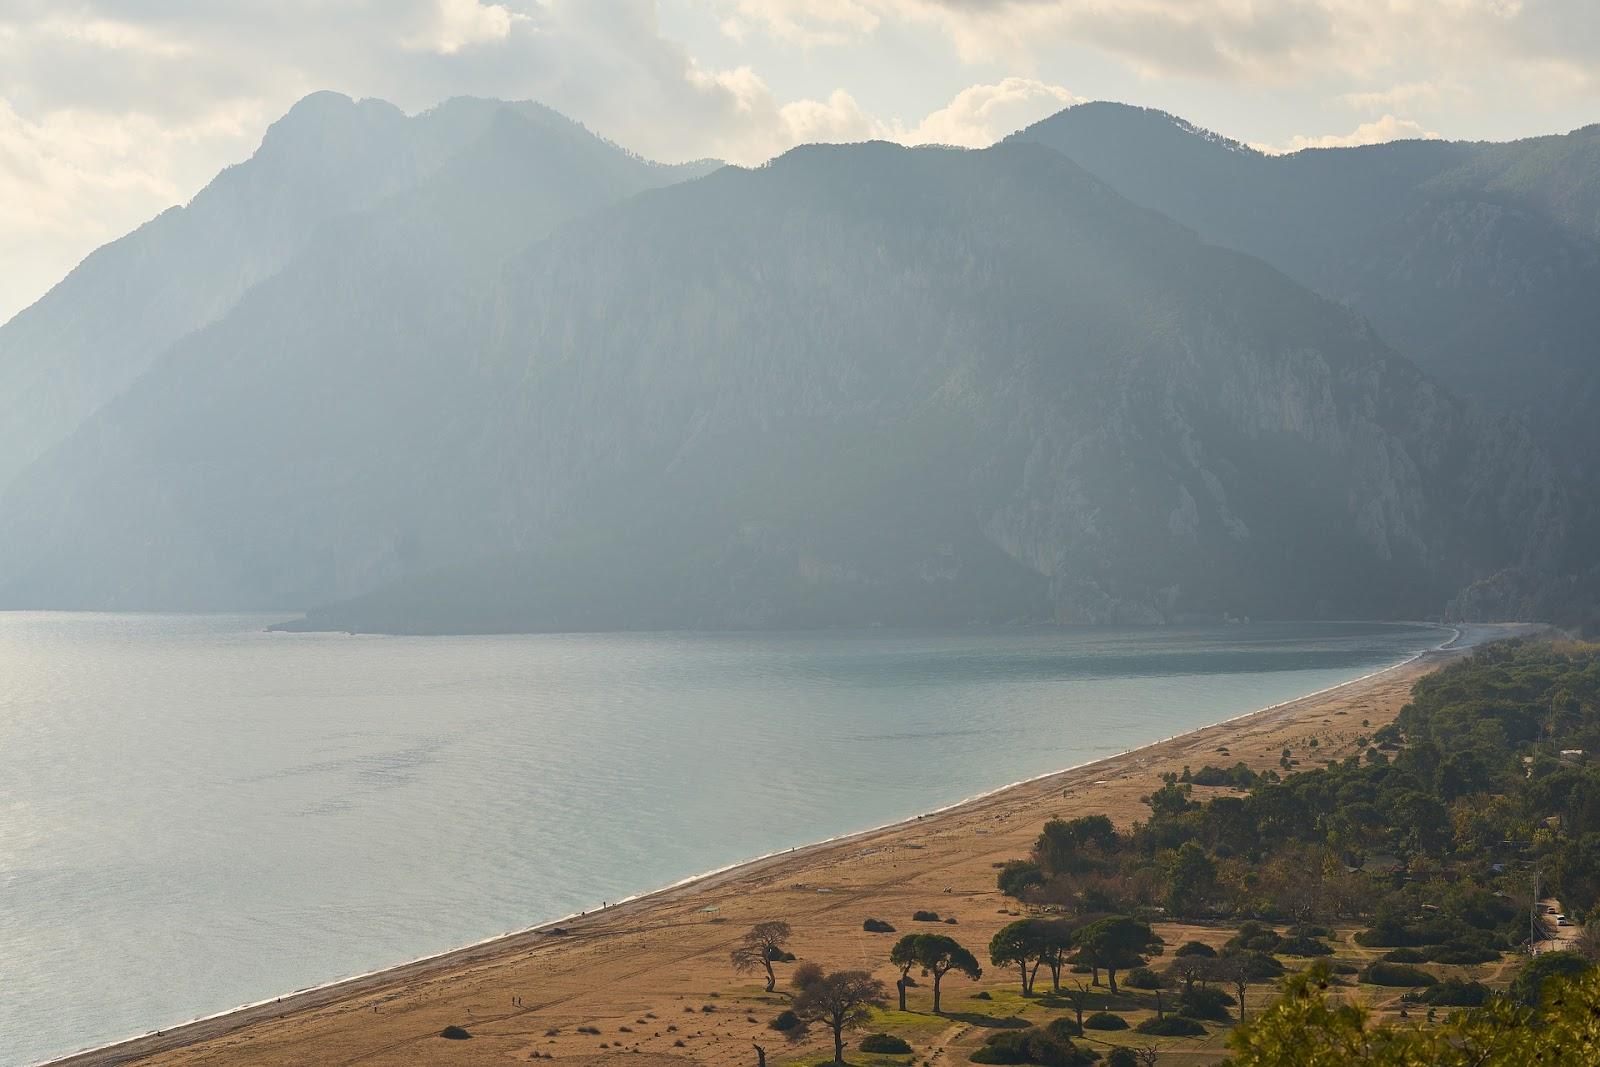 adrasan sandy secluded beach calm sea large mountains turkey riviera